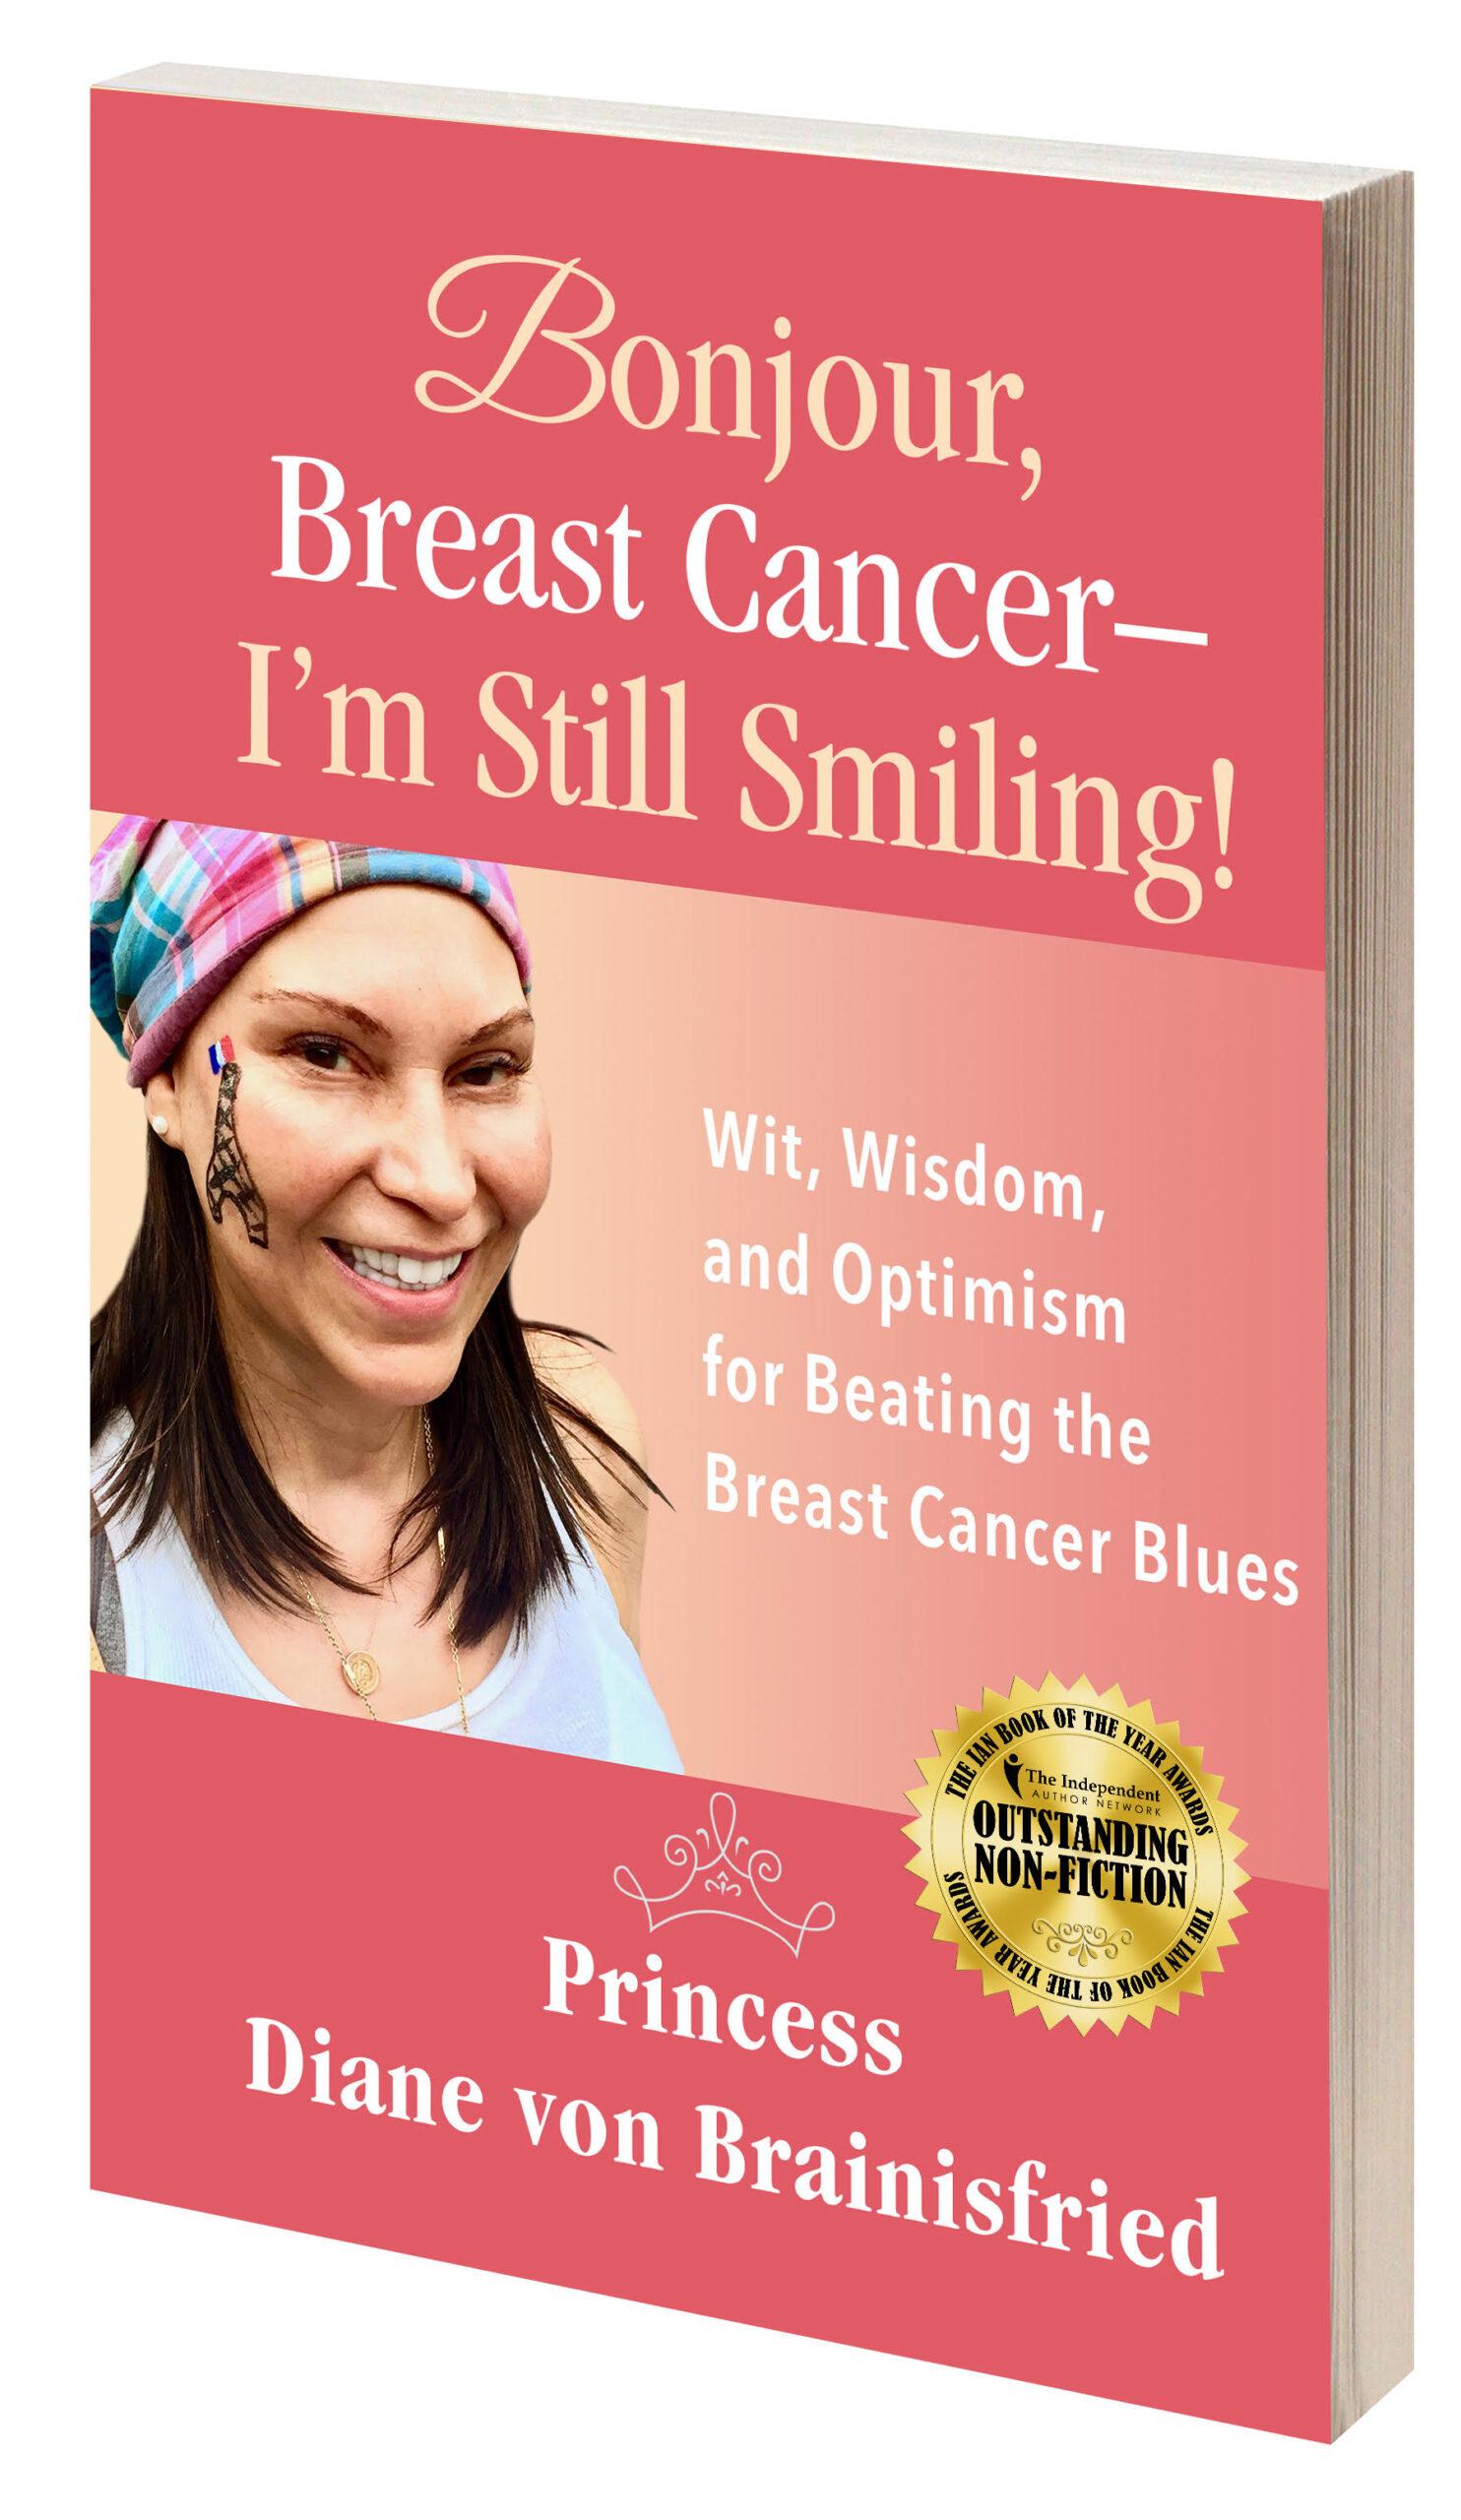 Bonjour, Breast Cancer - I'm Still Smiling! book cover